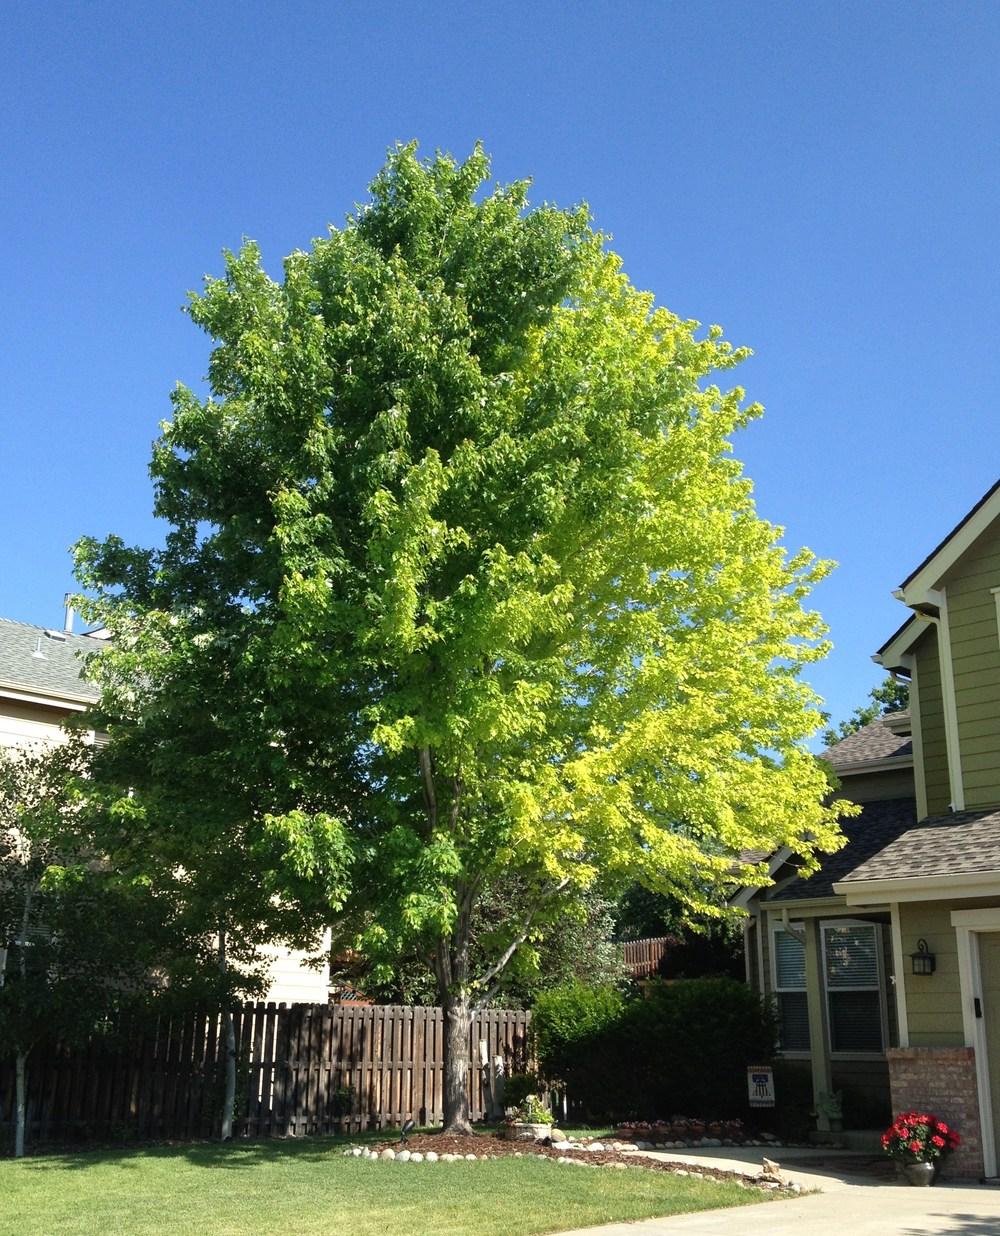 Maple_Tree_front_yard_June_2013_original.jpg